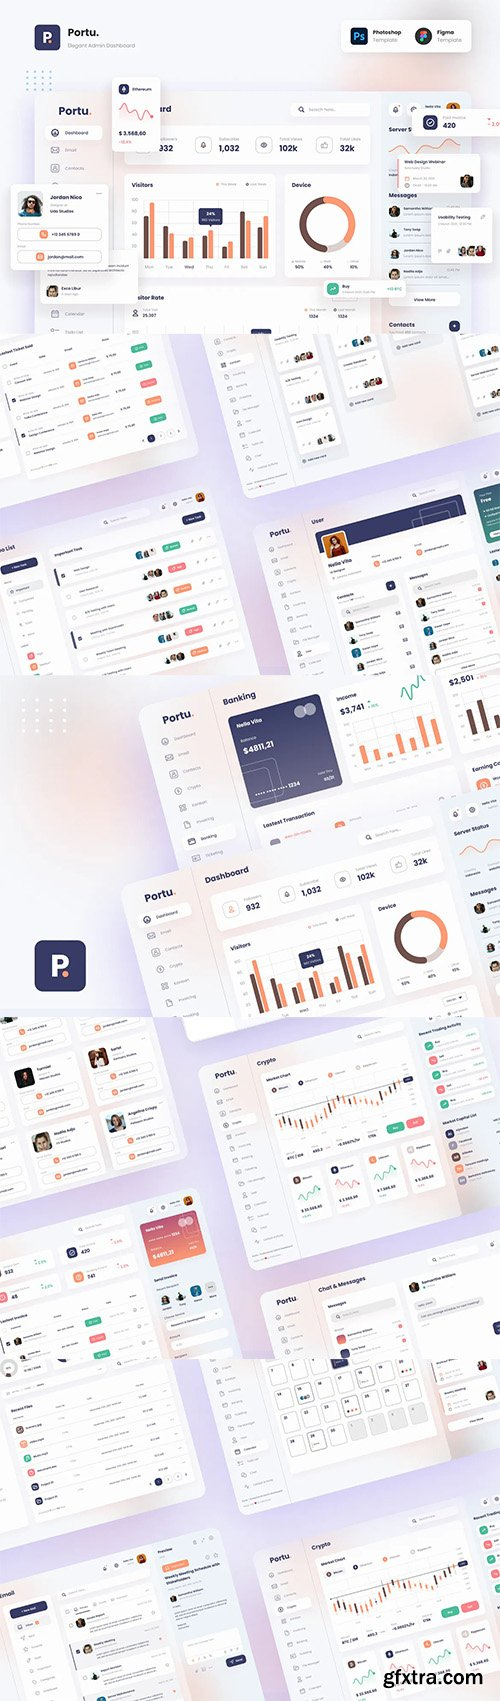 Portu - Elegant and Professional Admin Dashboard